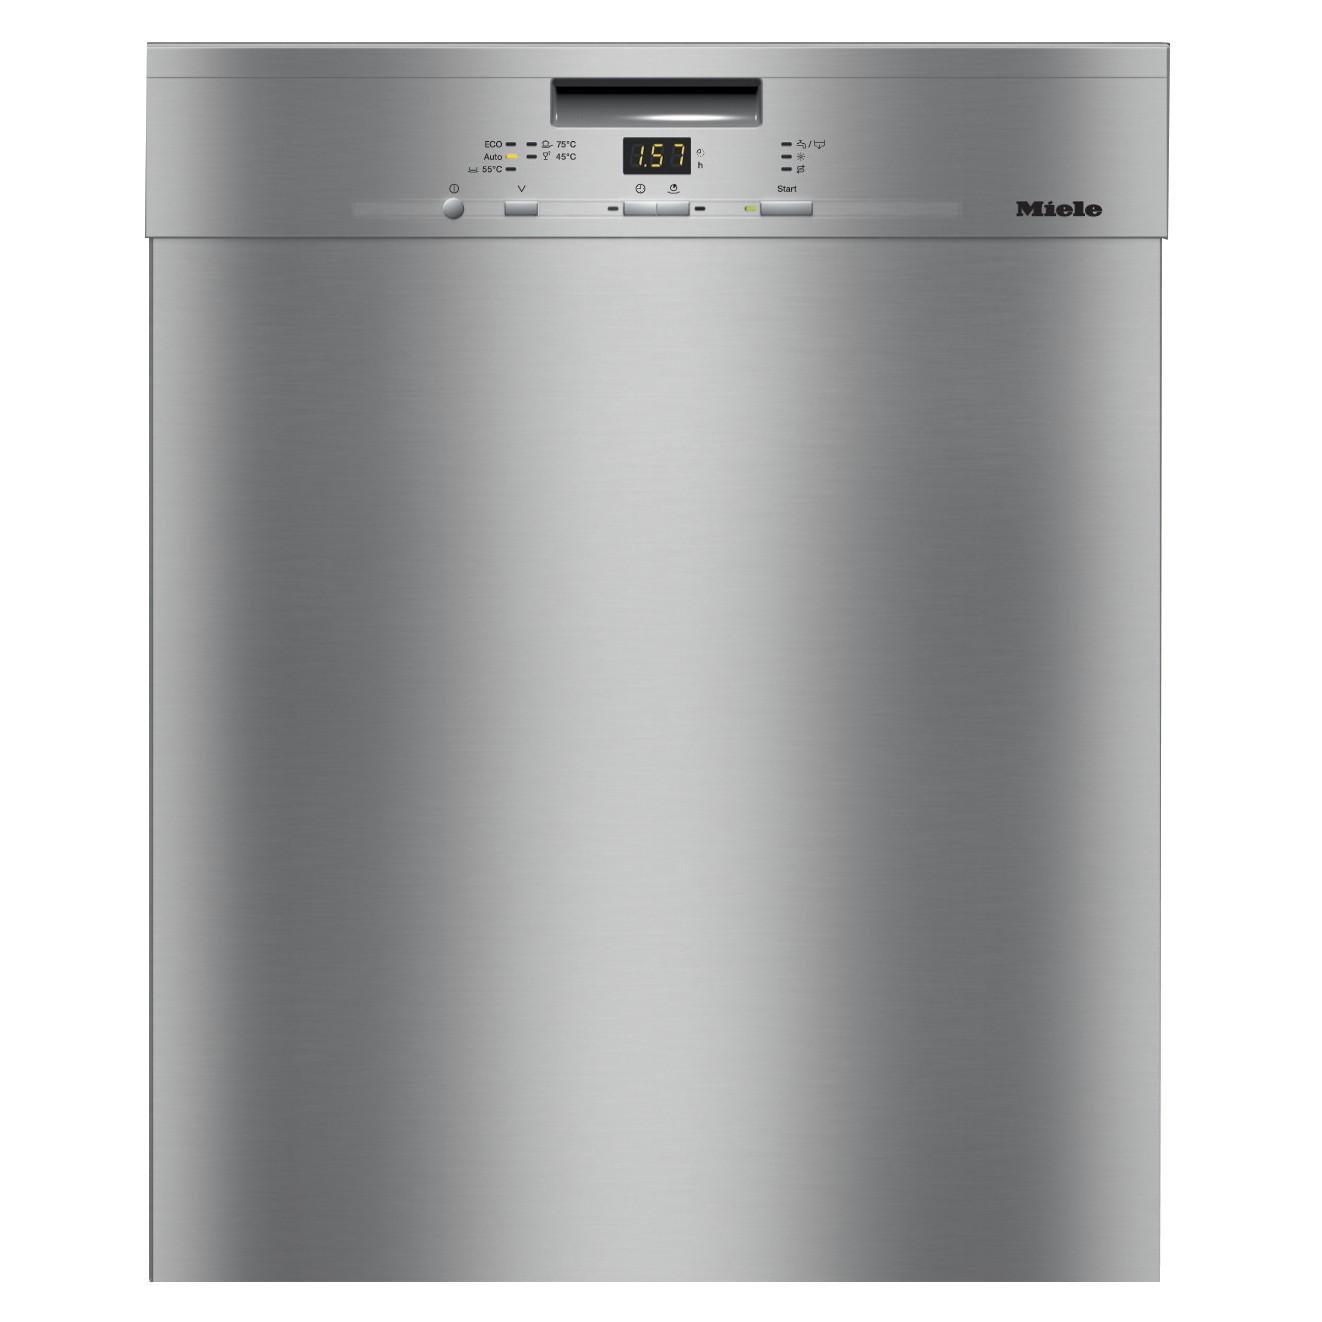 G4914SCUSTEEL : Miele oppvaskmaskin G4914SCUSTEEL (stål)